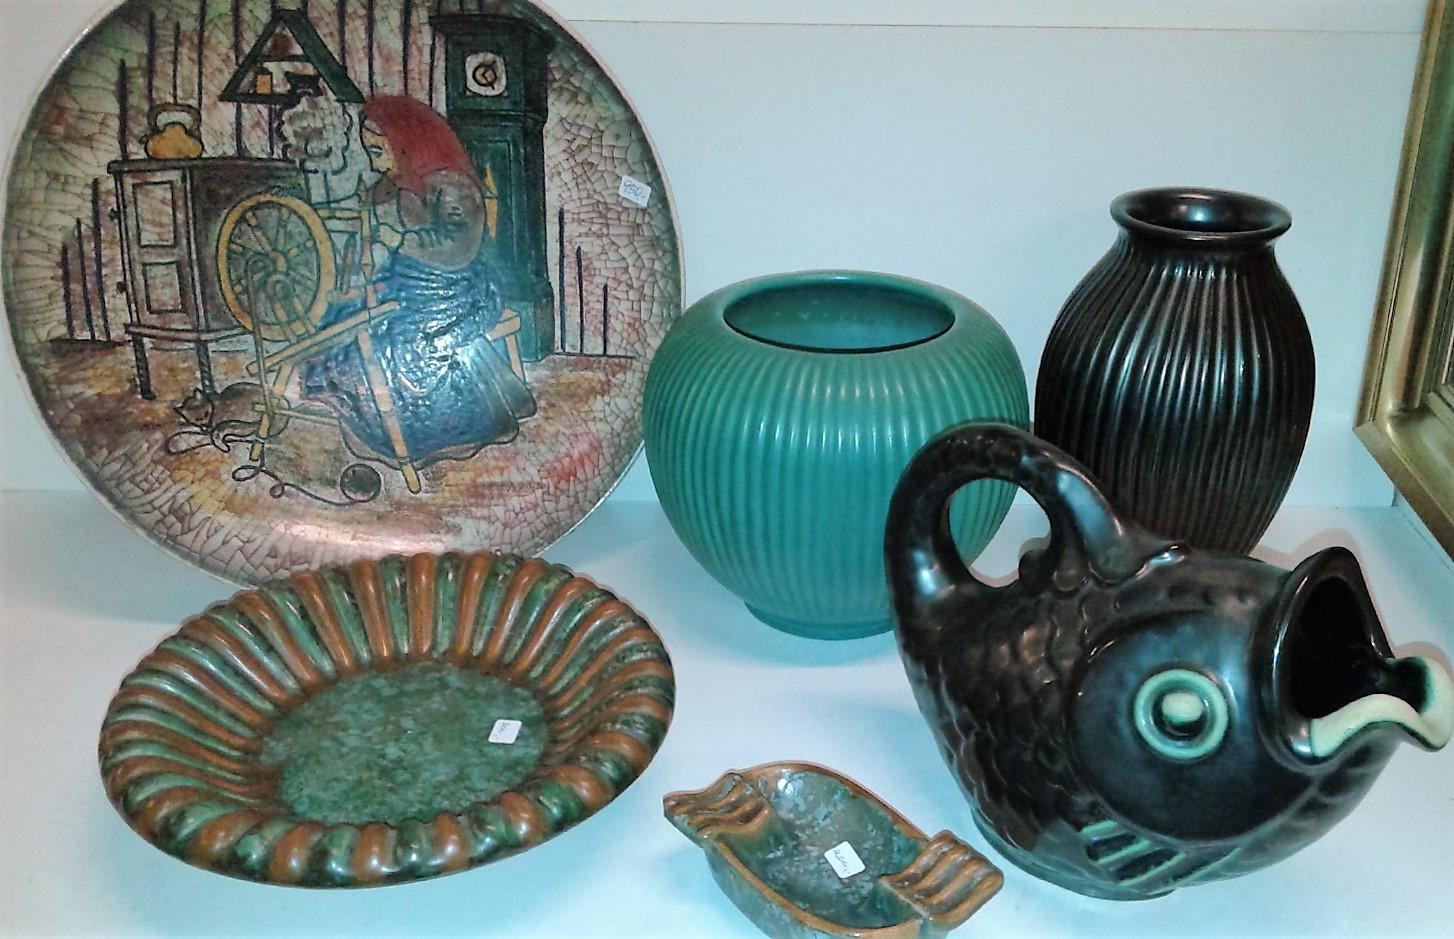 keramik bornholm MICHAEL ANDERSEN & søn OG JOHGUS KERAMIK POTTERY BORNHOLM DANMARK keramik bornholm